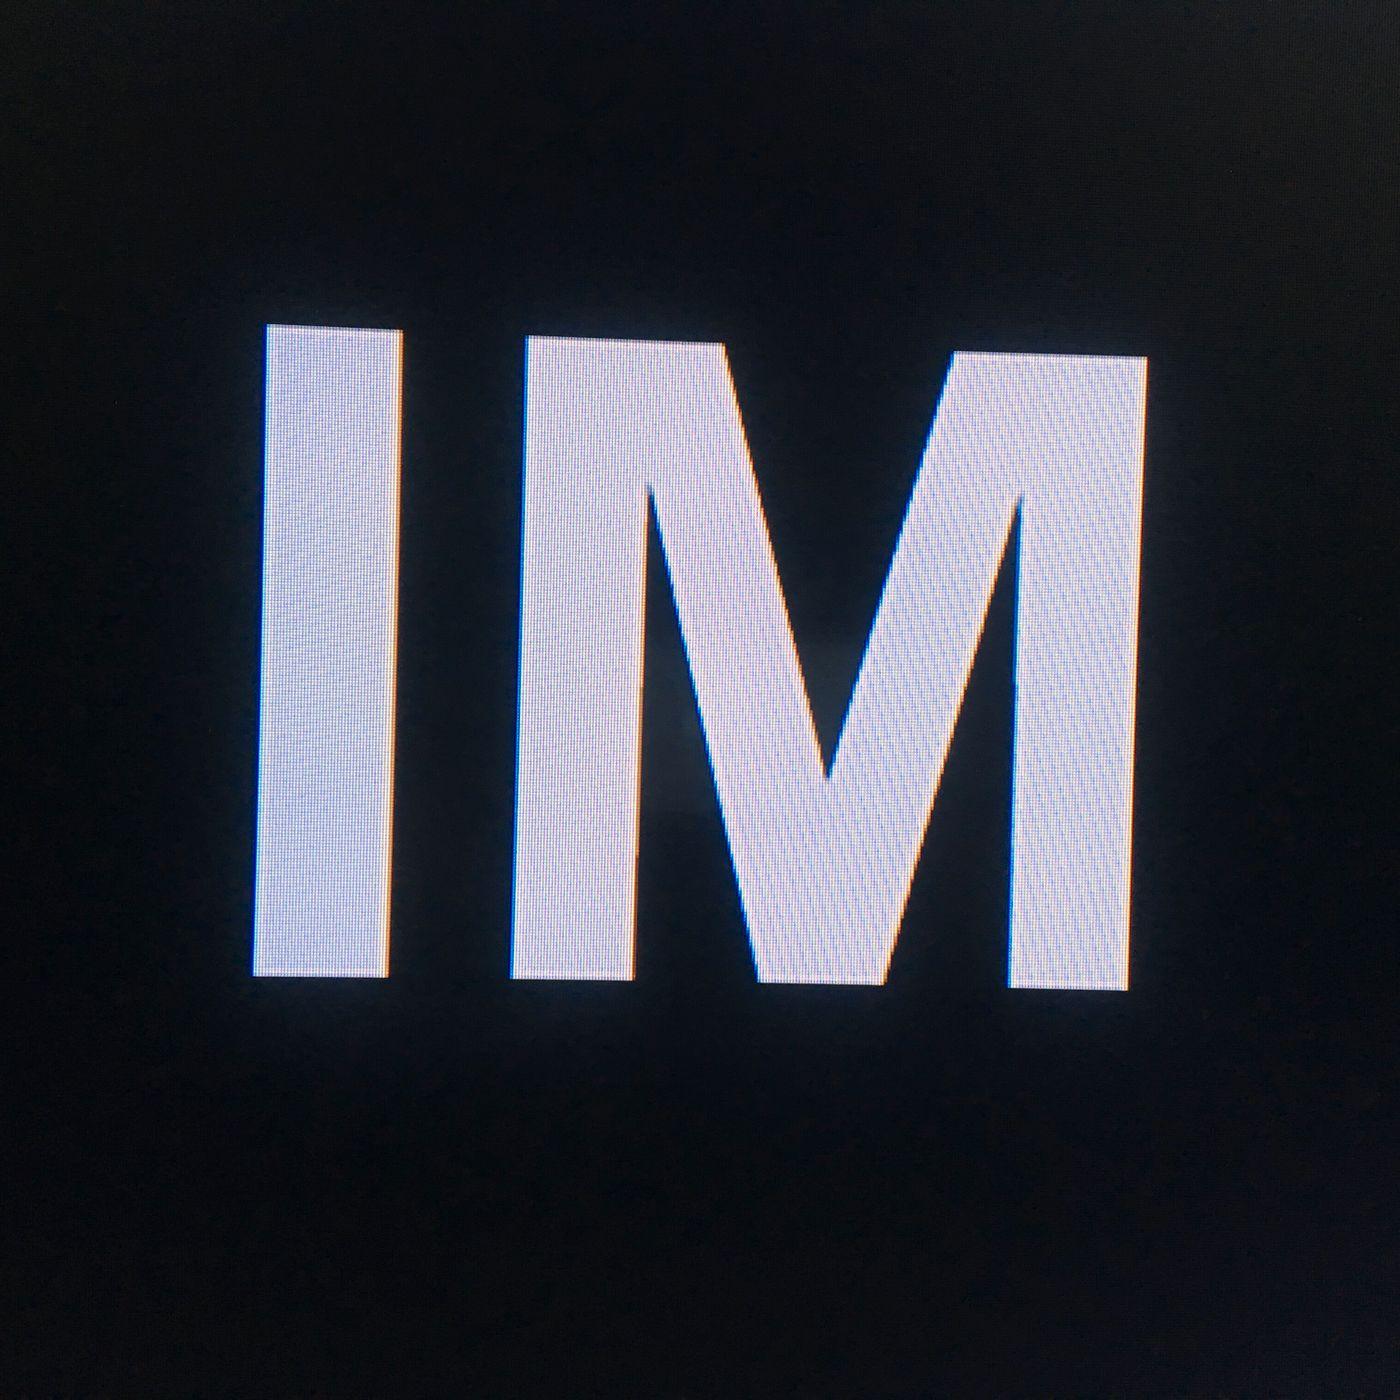 IM Episode 6 - Bro Code